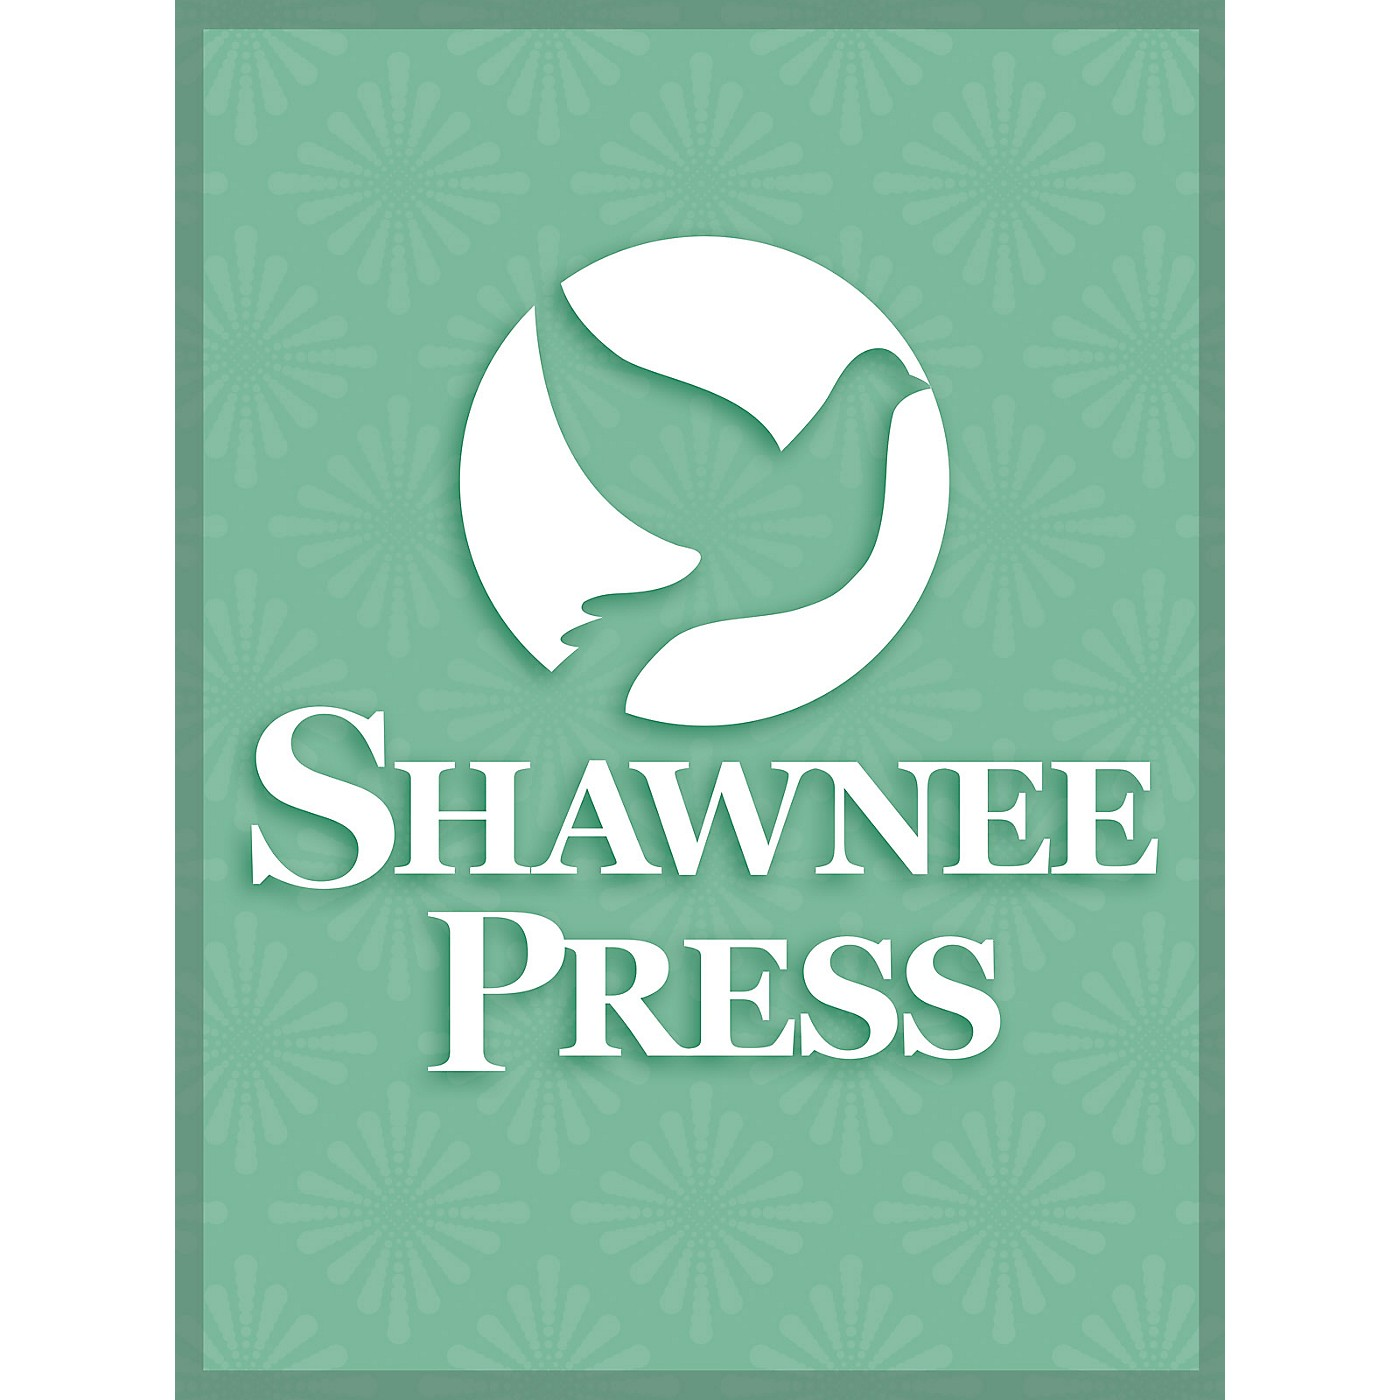 Shawnee Press Second Sonata for Trombone and Piano (Trombone Solo) Shawnee Press Series thumbnail